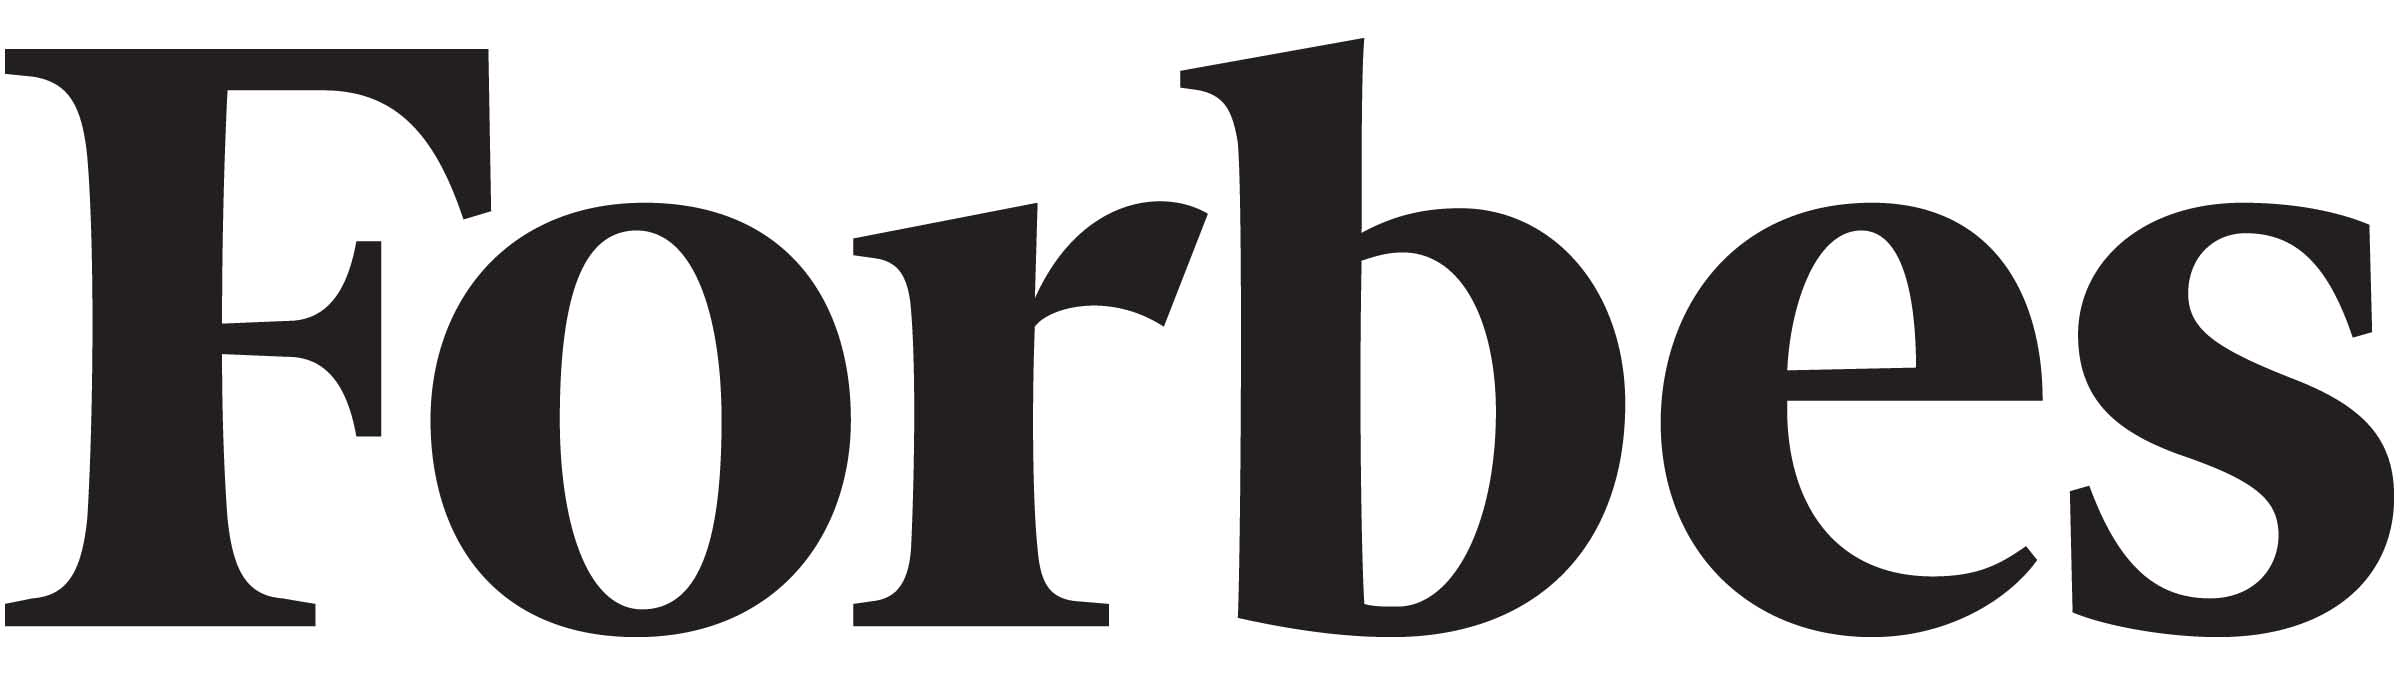 cut-234-Forbes_Logo.jpg